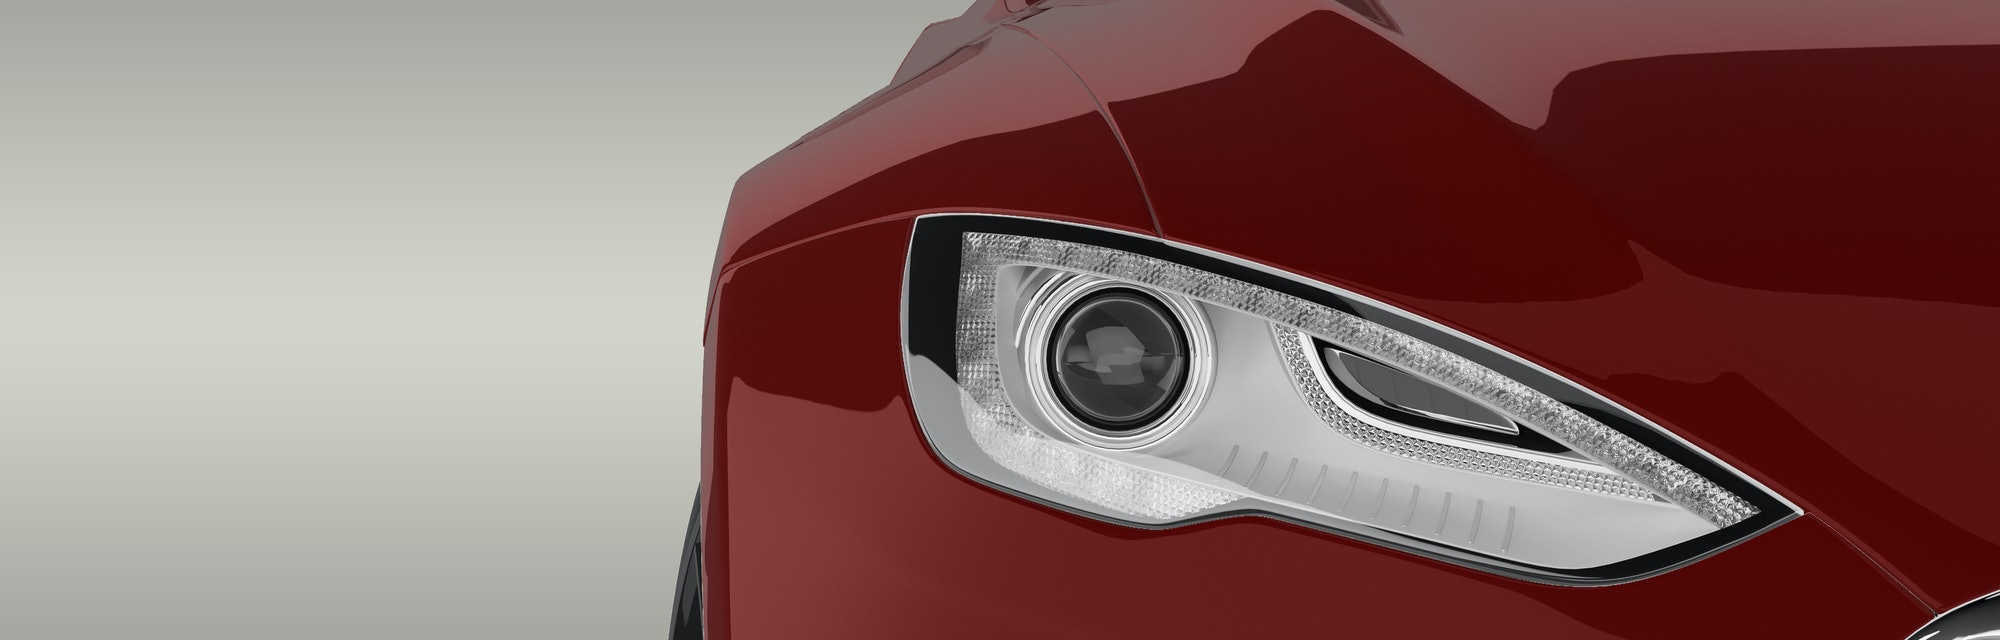 Electric Car Close-up 3D Rendering